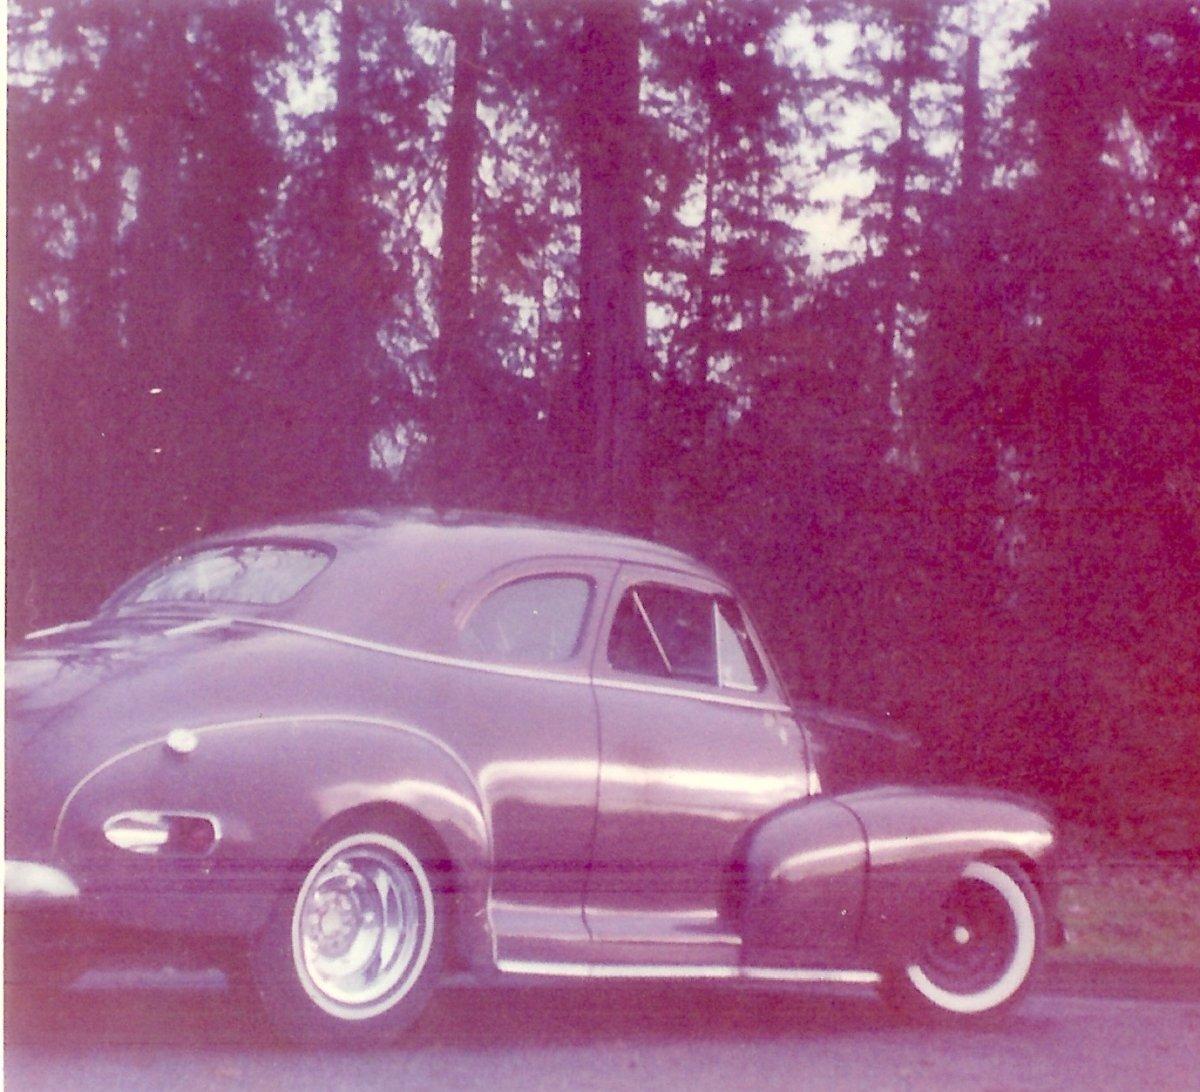 47_Chev_rear_1962_a.JPG